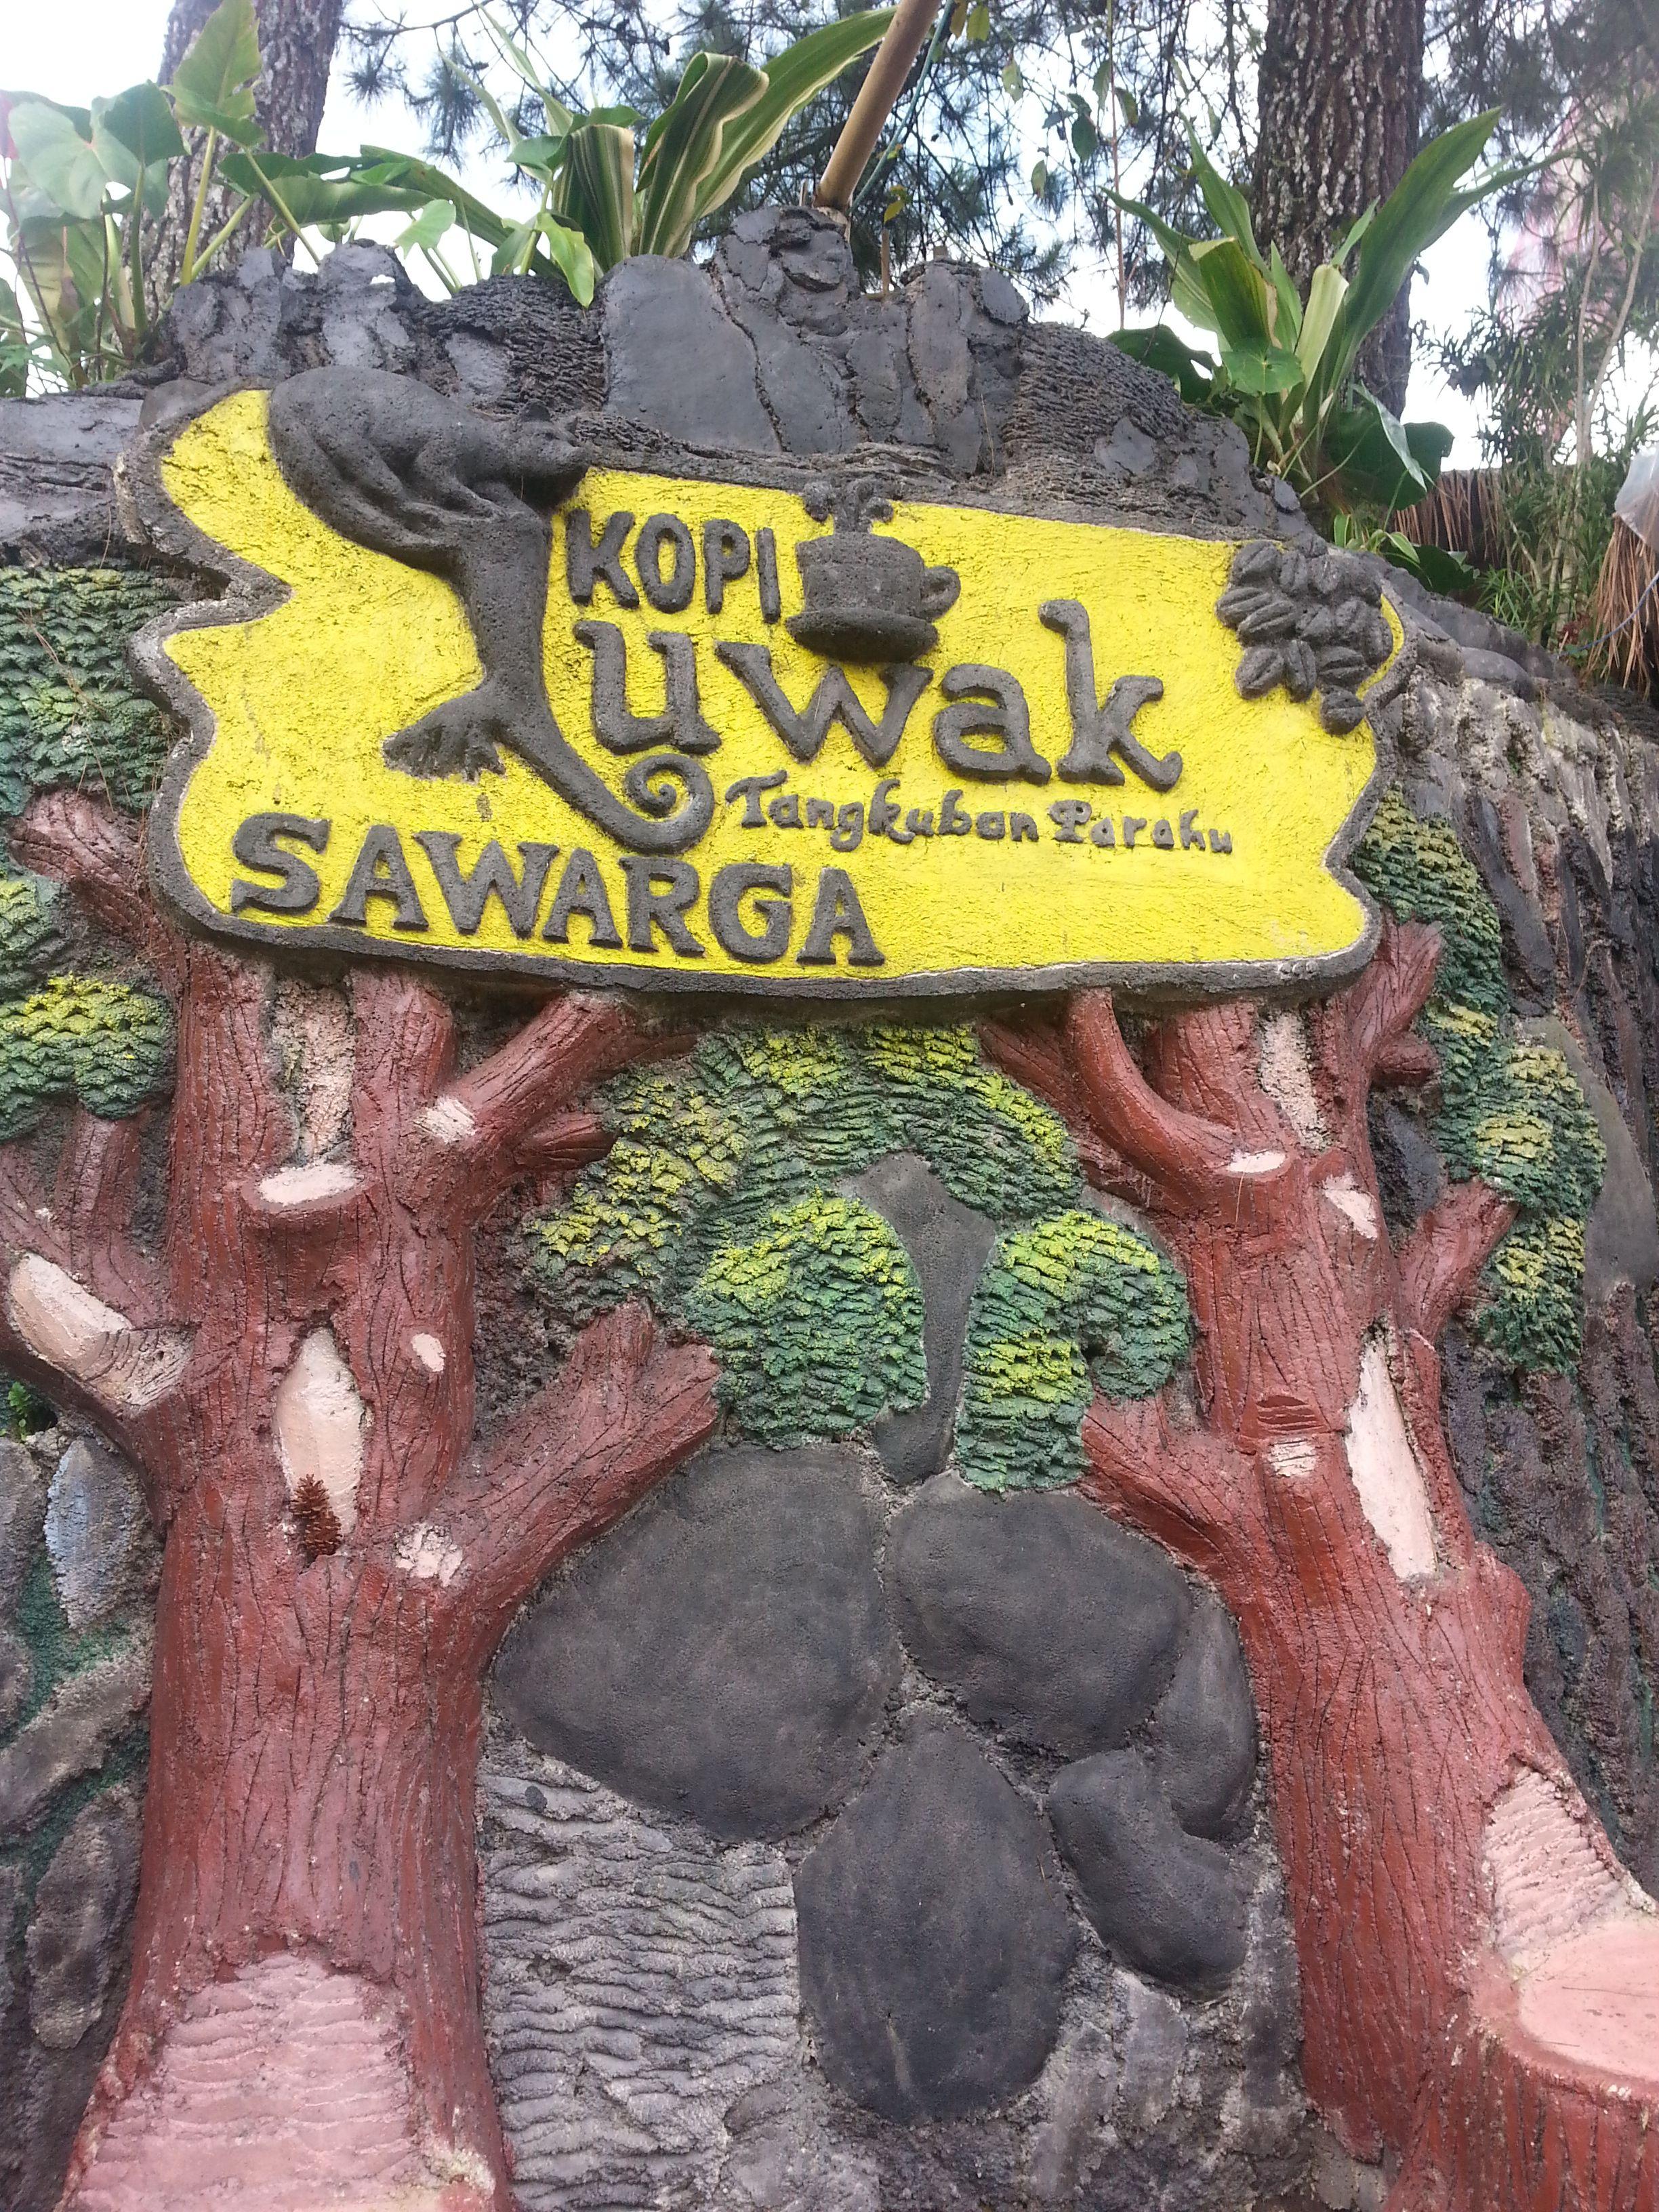 Kopi Luwak / Wild civet coffee farm (Bandung) Marie